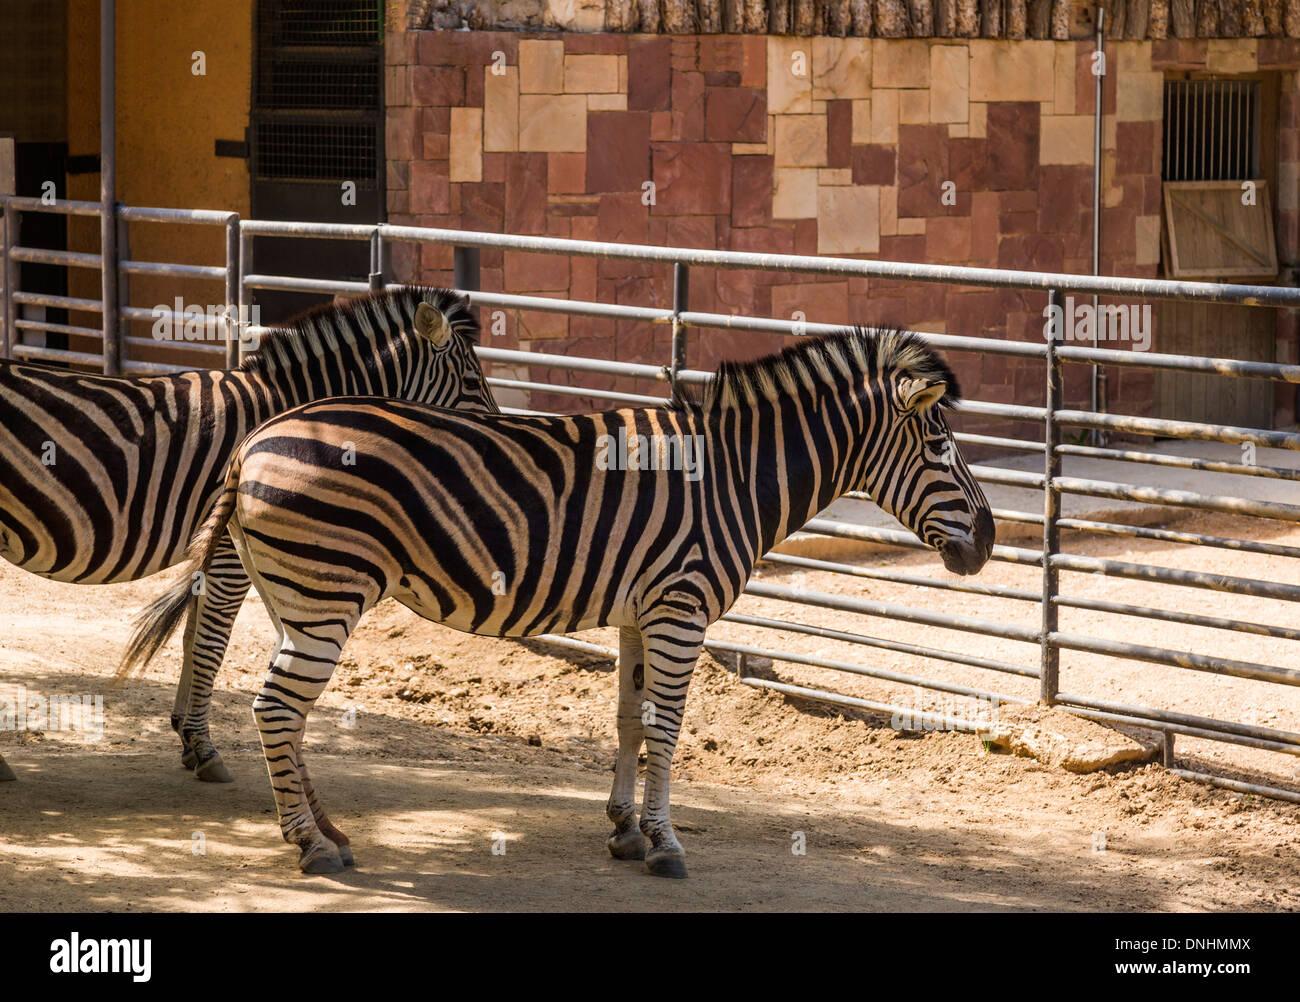 Cebras de Chapman (Equus quagga chapmani) en un zoo, el Zoo de Barcelona, Barcelona, Cataluña, España Foto de stock